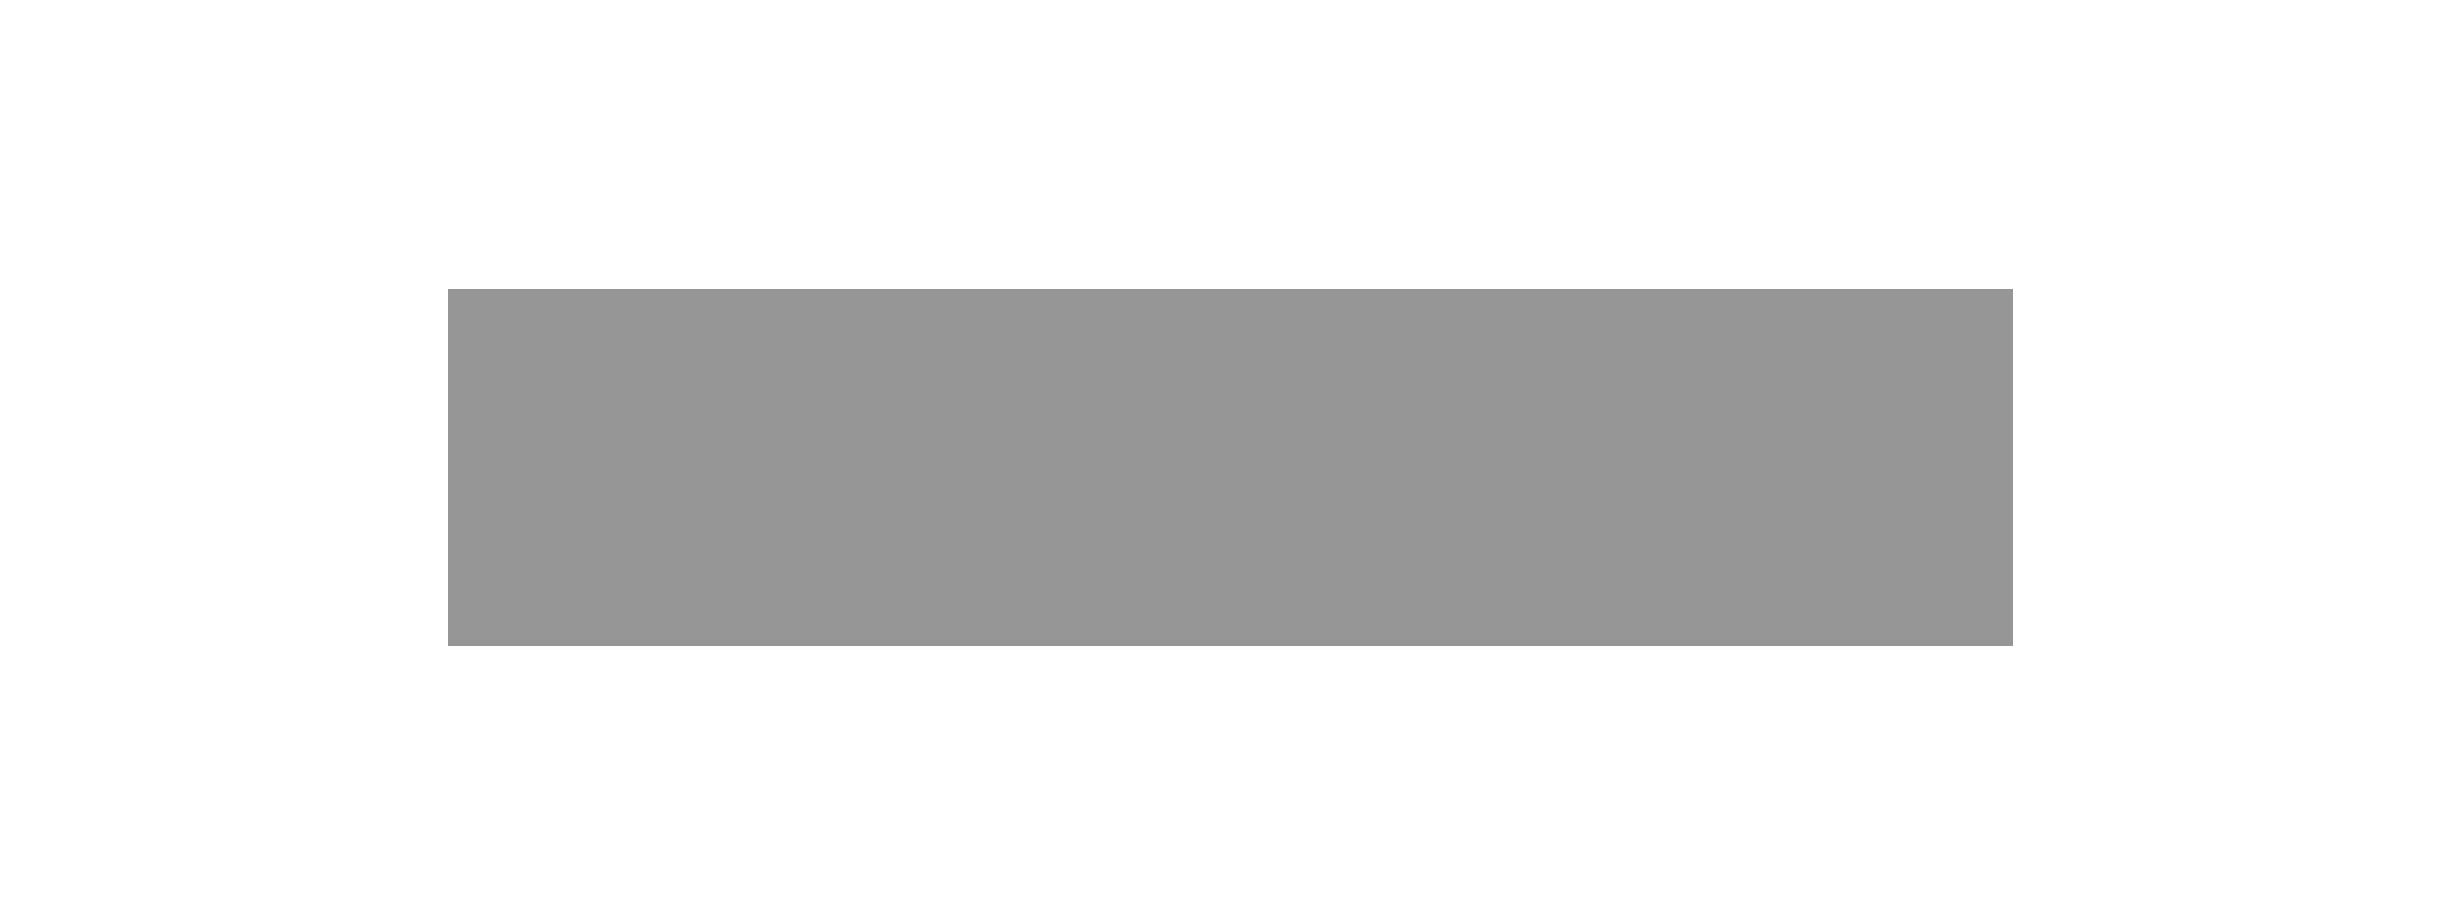 BLNDN_logo.png